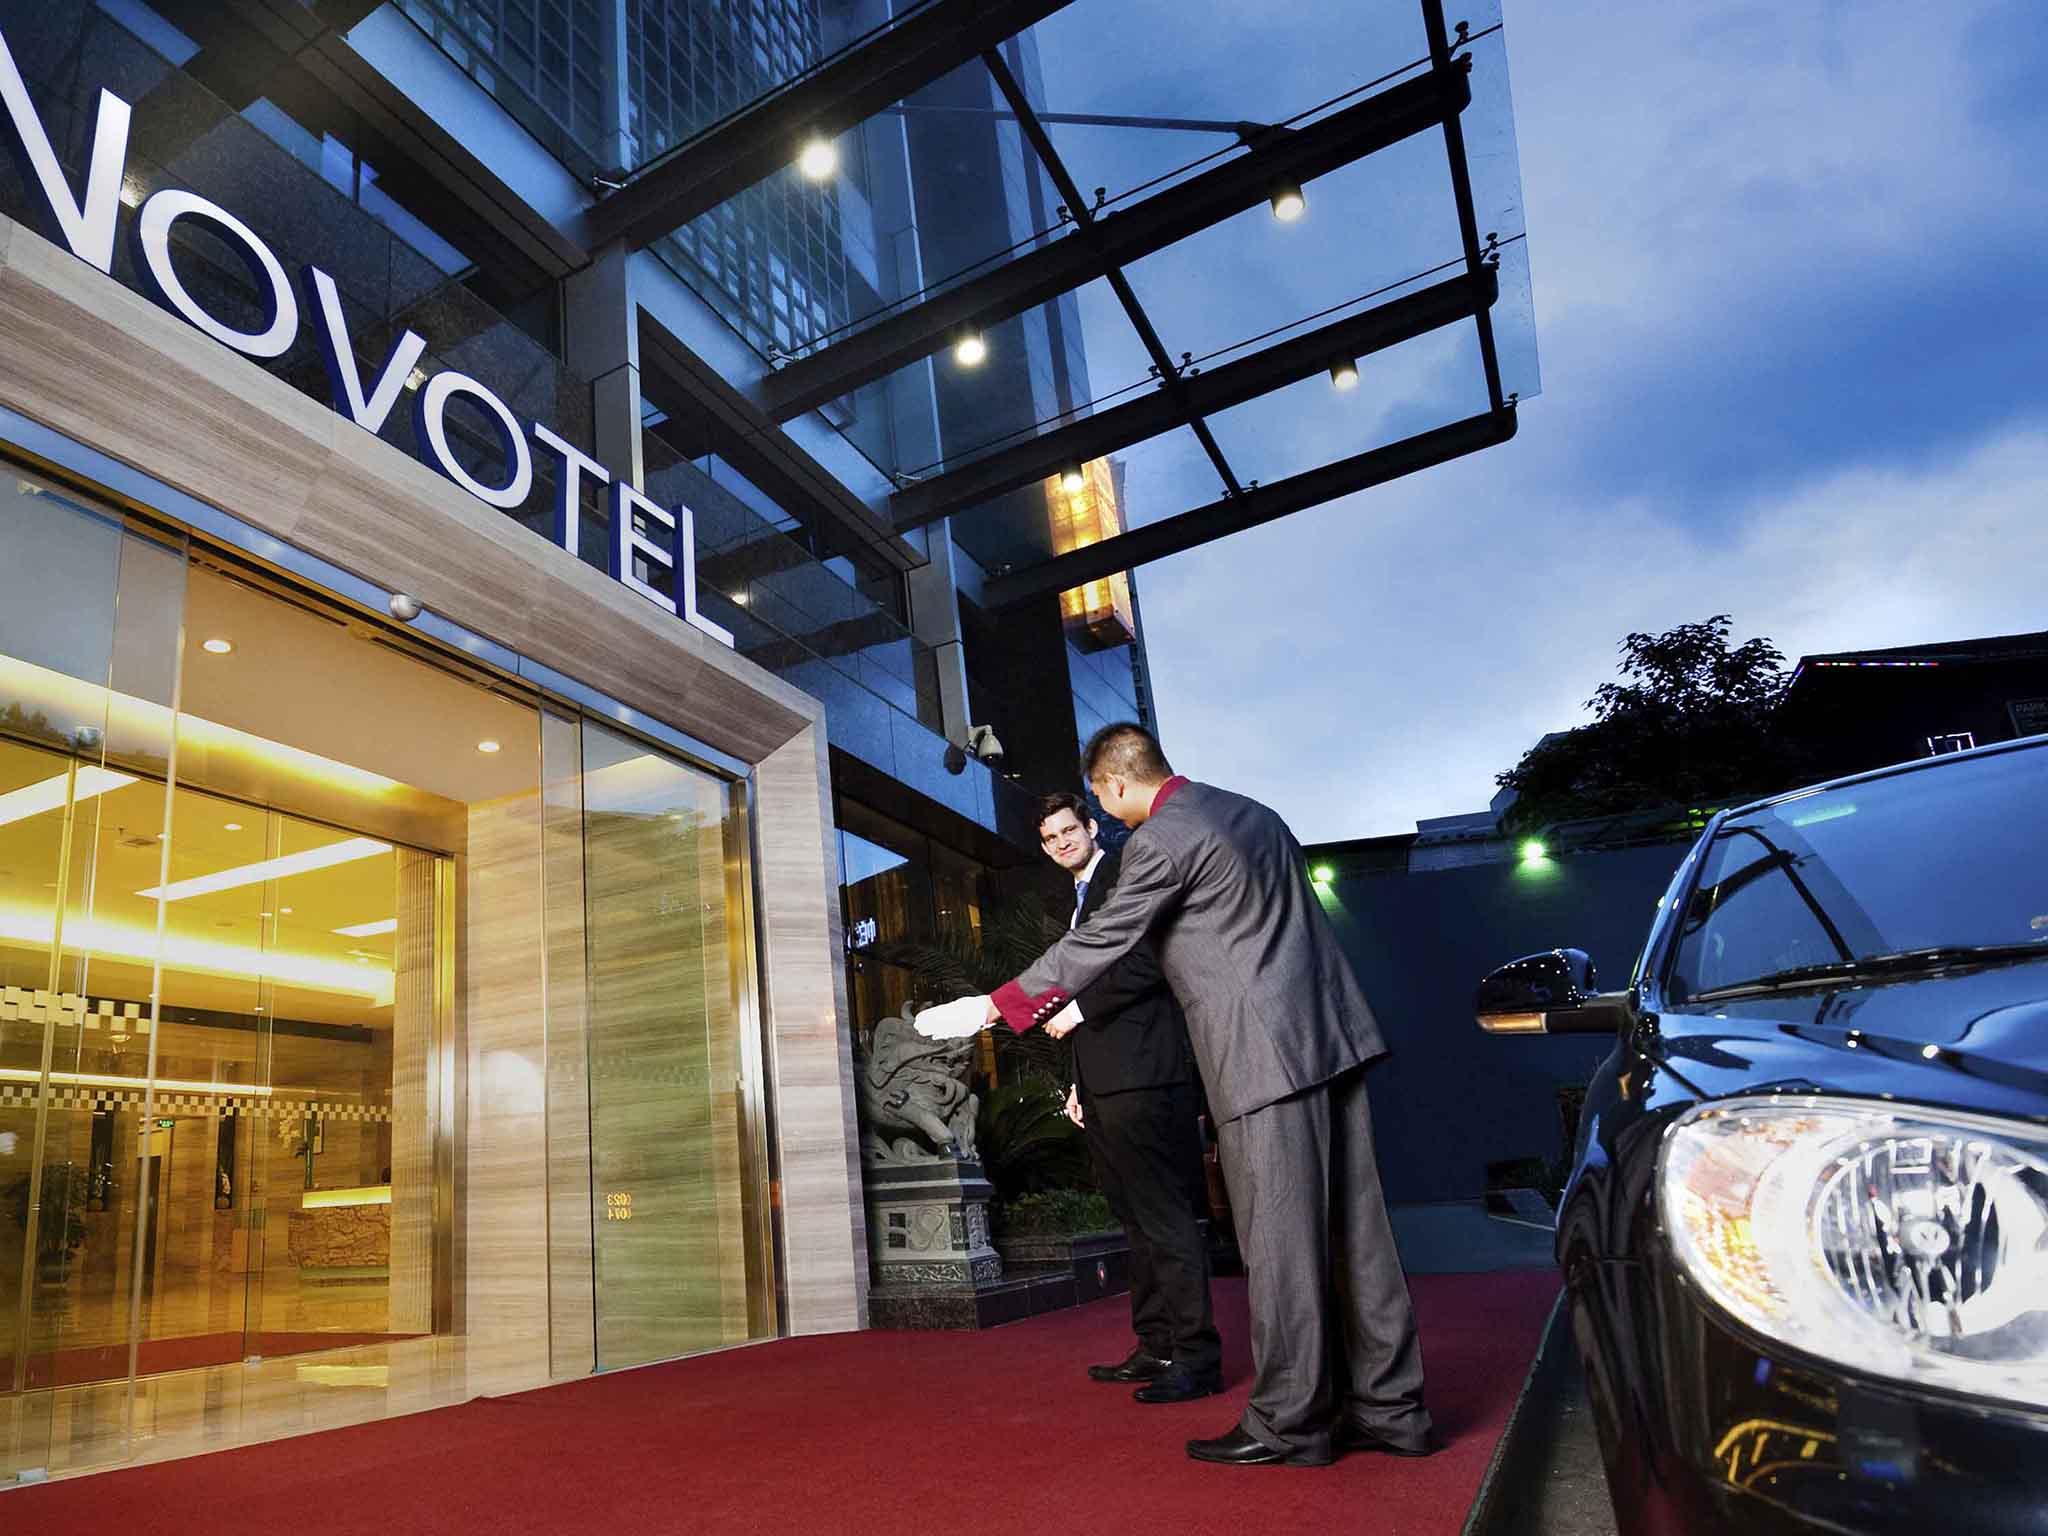 فندق - Novotel Guiyang Downtown